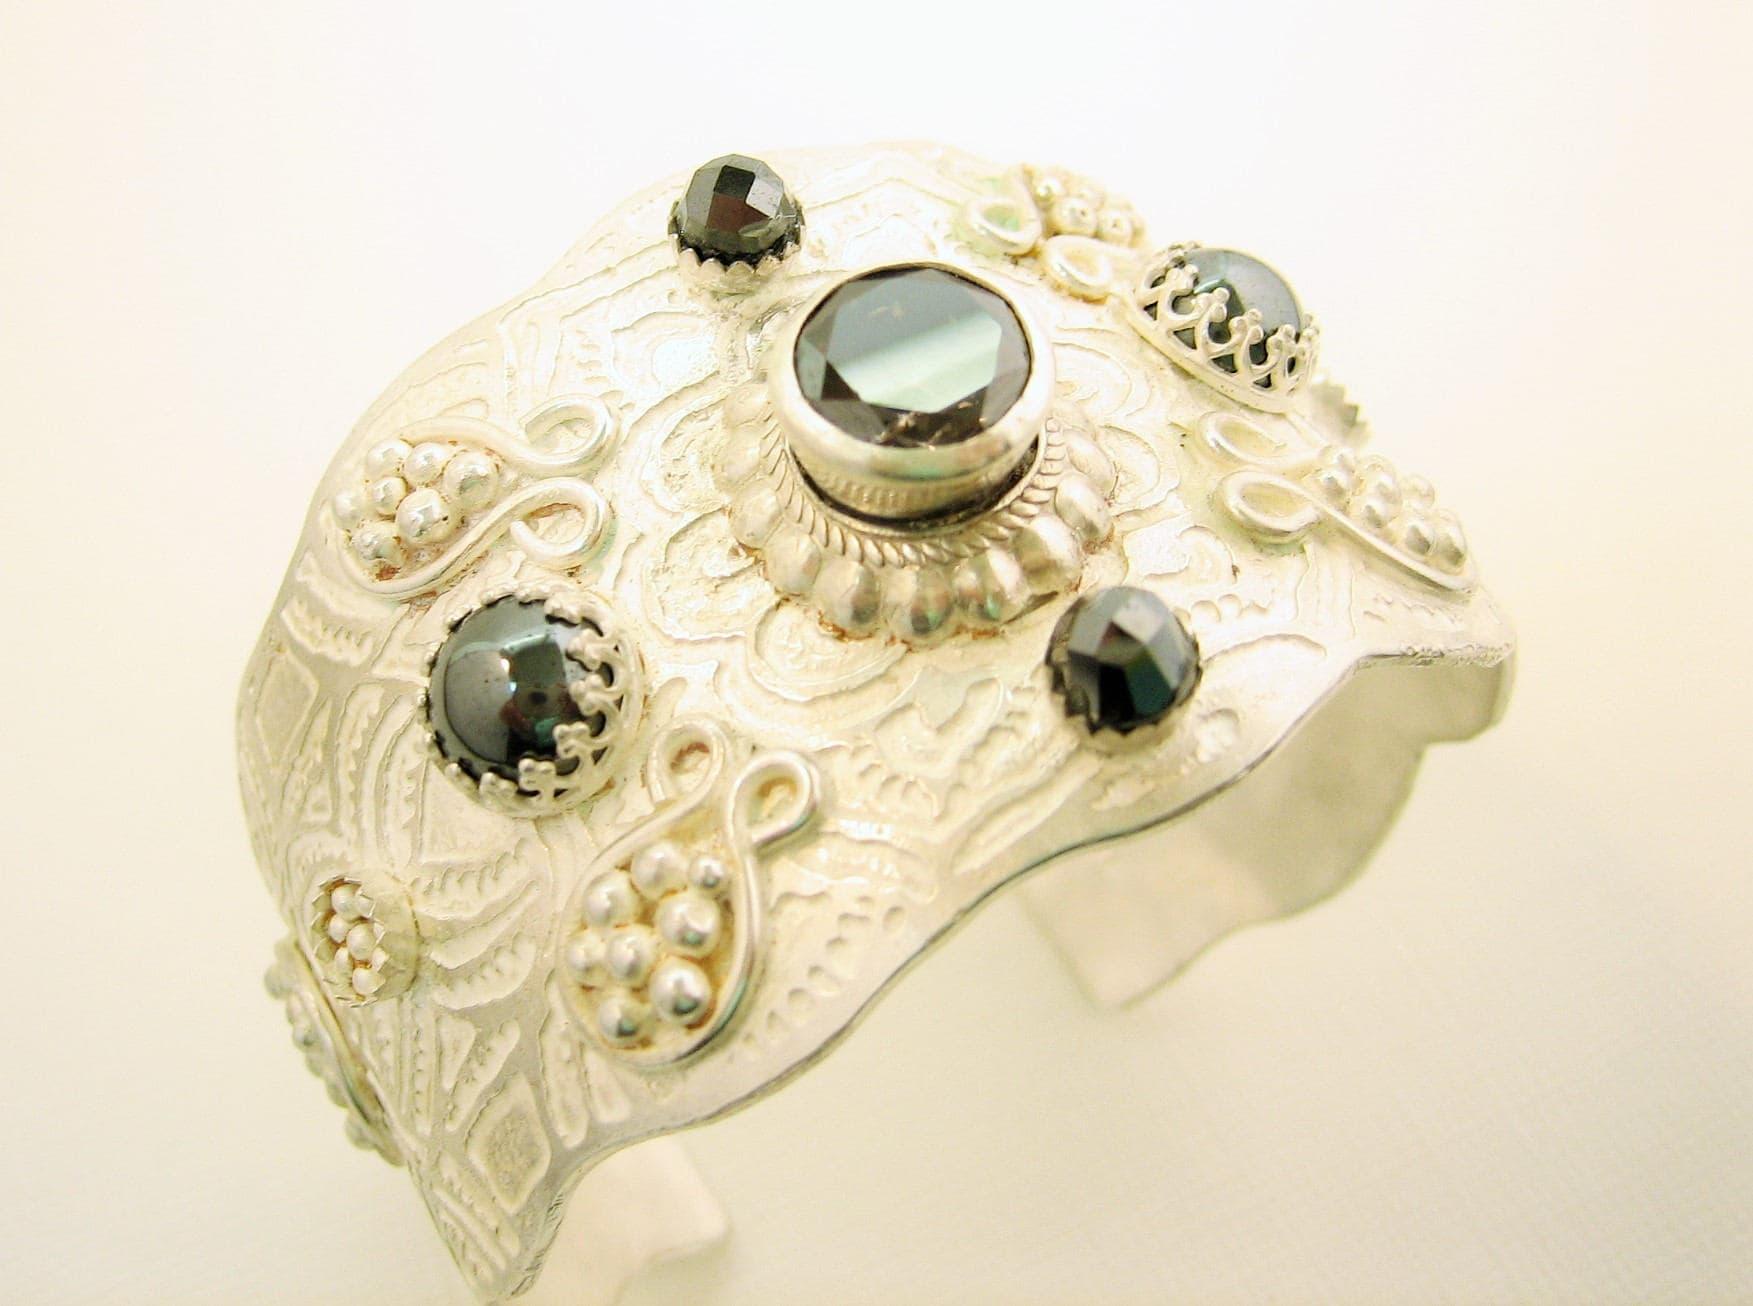 Handmade one of a kind sterling silver cuff bracelet, etched silver artisan bracelet, heirloom wide statement cuff bracelet with gemstones